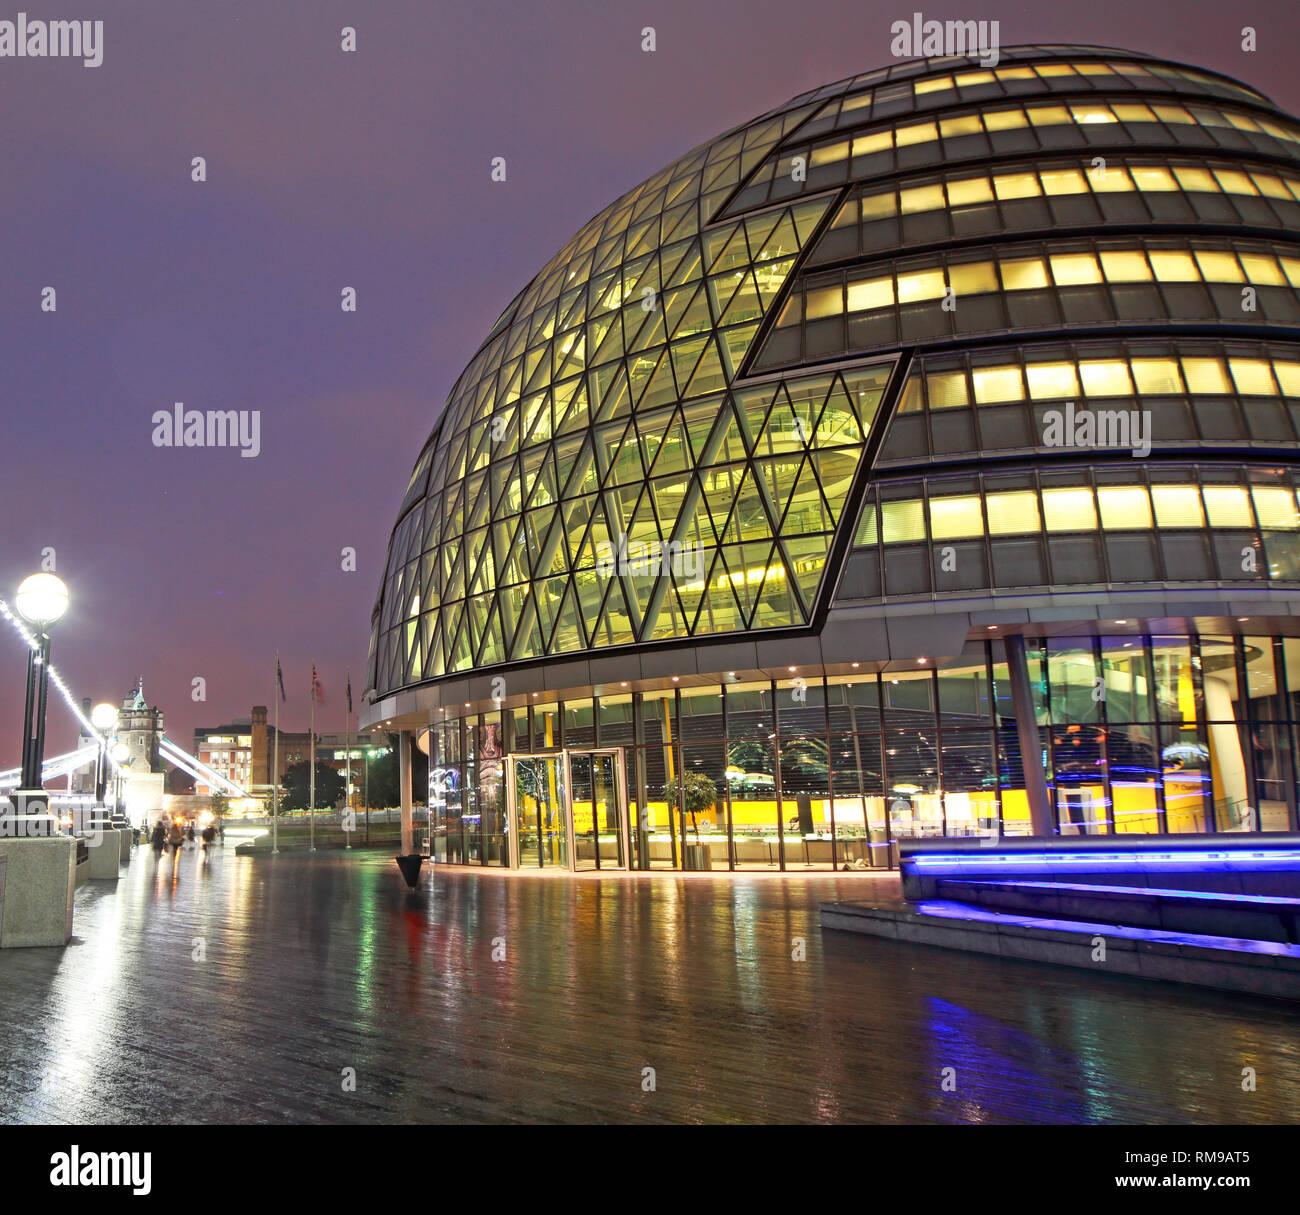 Laden Sie dieses Alamy Stockfoto London City Hall am Abend, der Queen's Walk, London, England, UK, SE1 2AA - RM9AT5